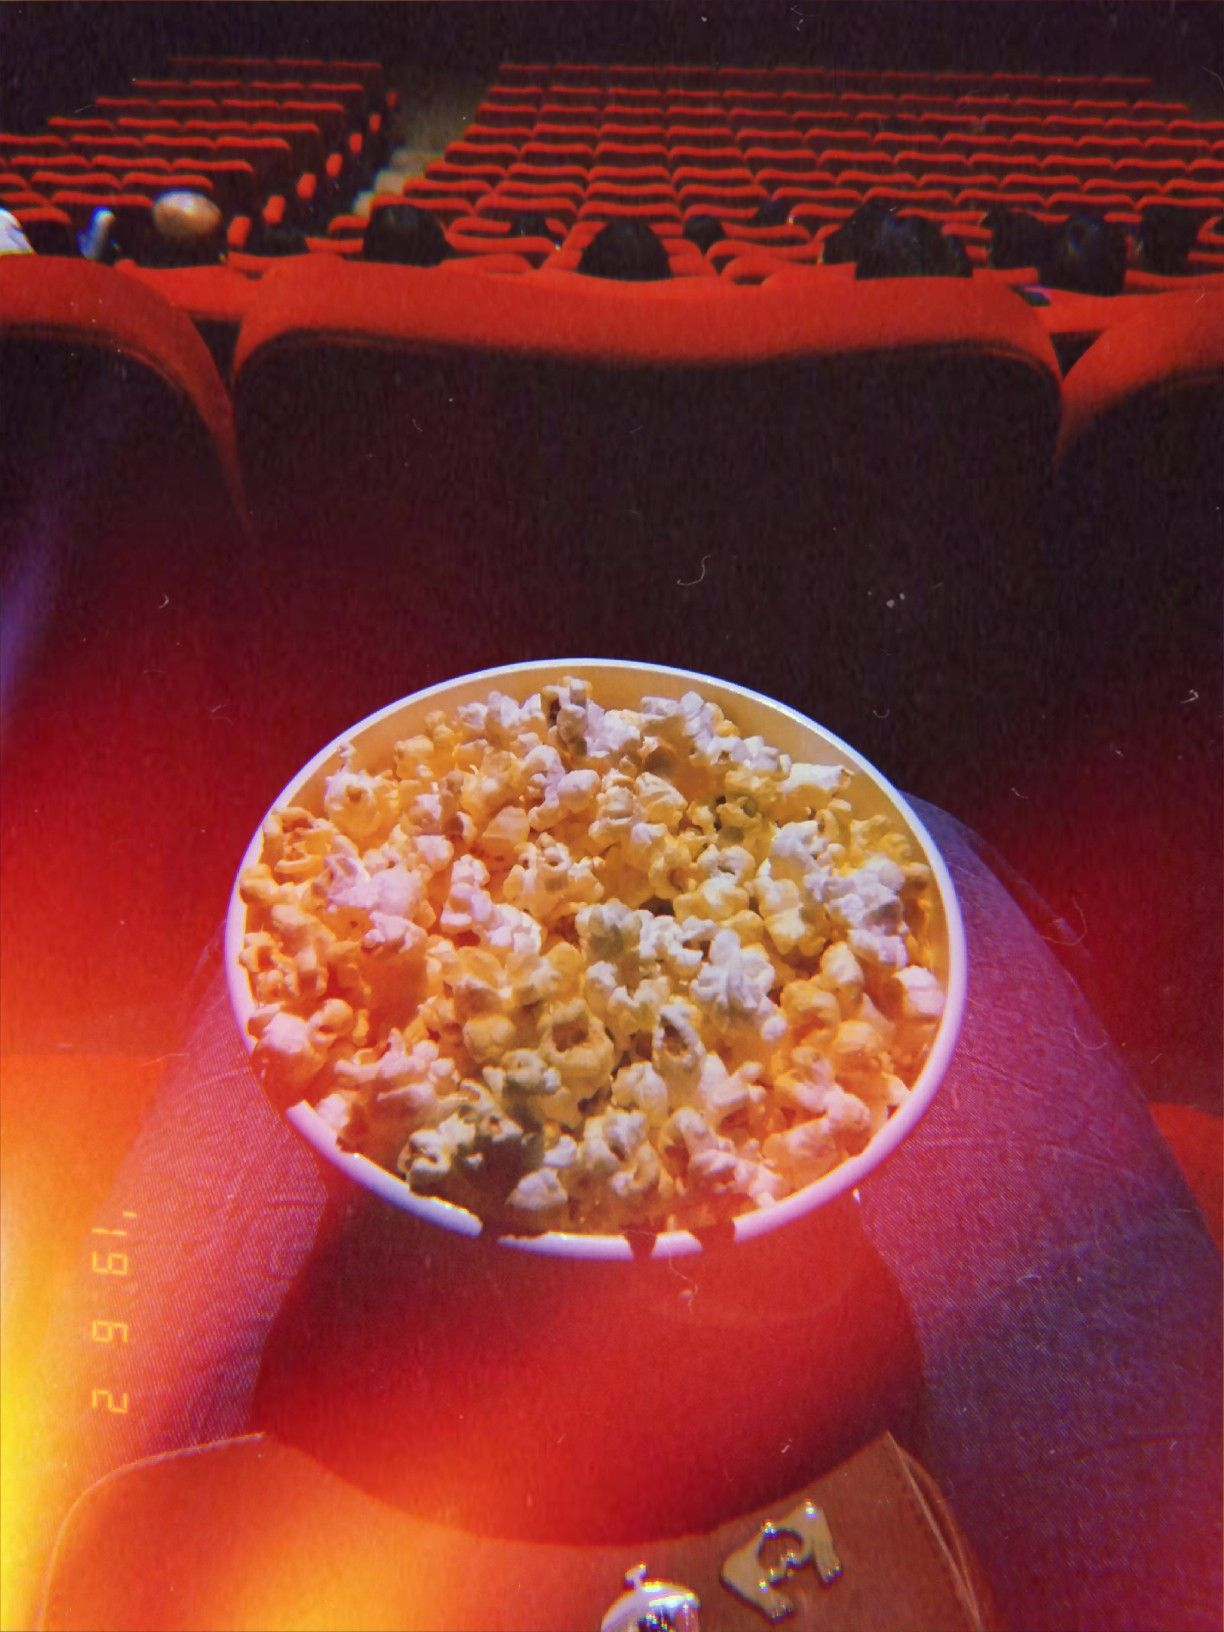 Cinema Xxi Popcorn Movie Makanan Bioskop